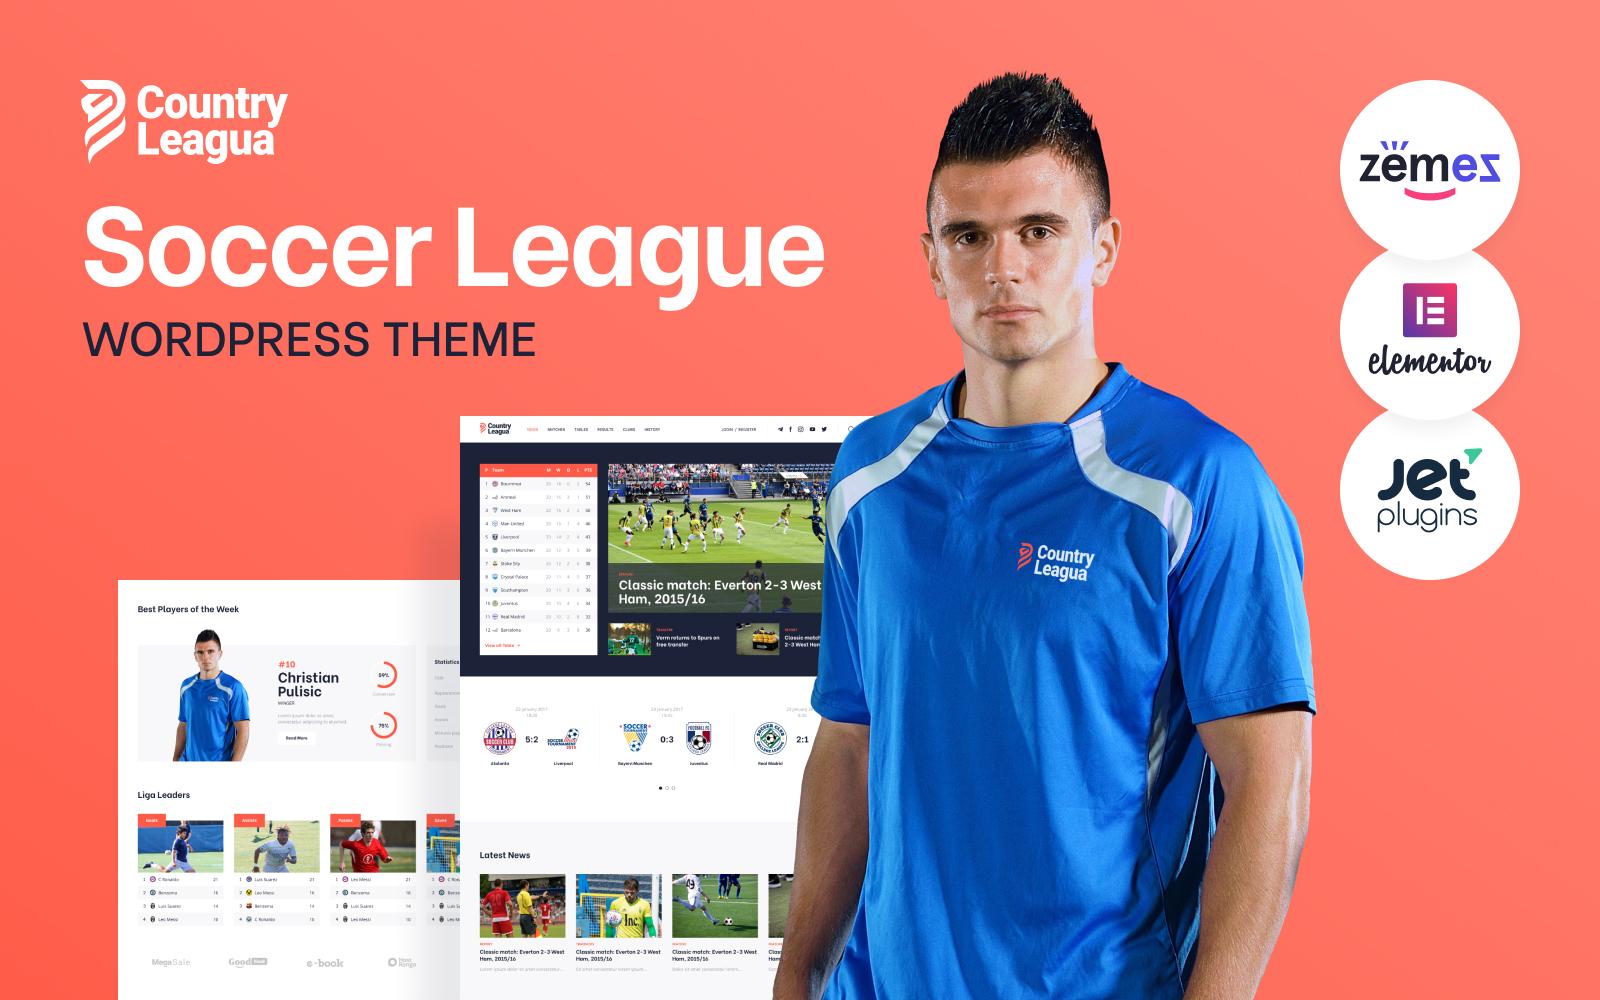 """Counter Leagua - Soccer League"" thème WordPress adaptatif #90497"